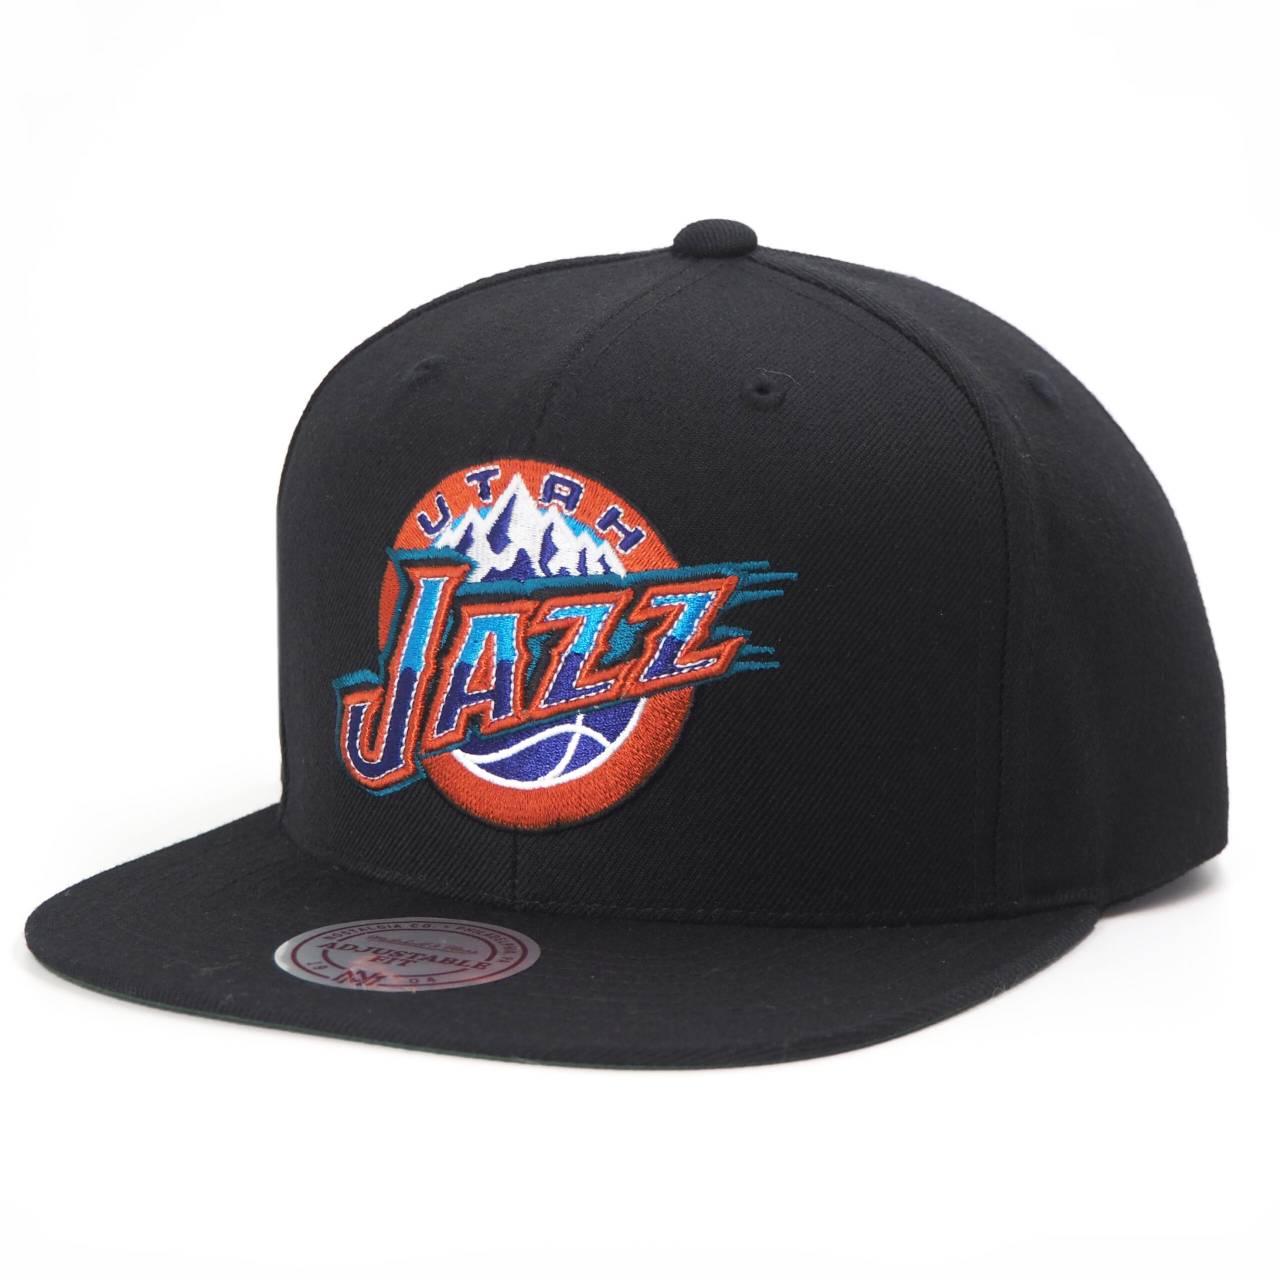 MN-HWC-INTL405-UTAJAZ-BLK NBA UTAH JAZZ WOOL SOLID SNAPBACK BLACK